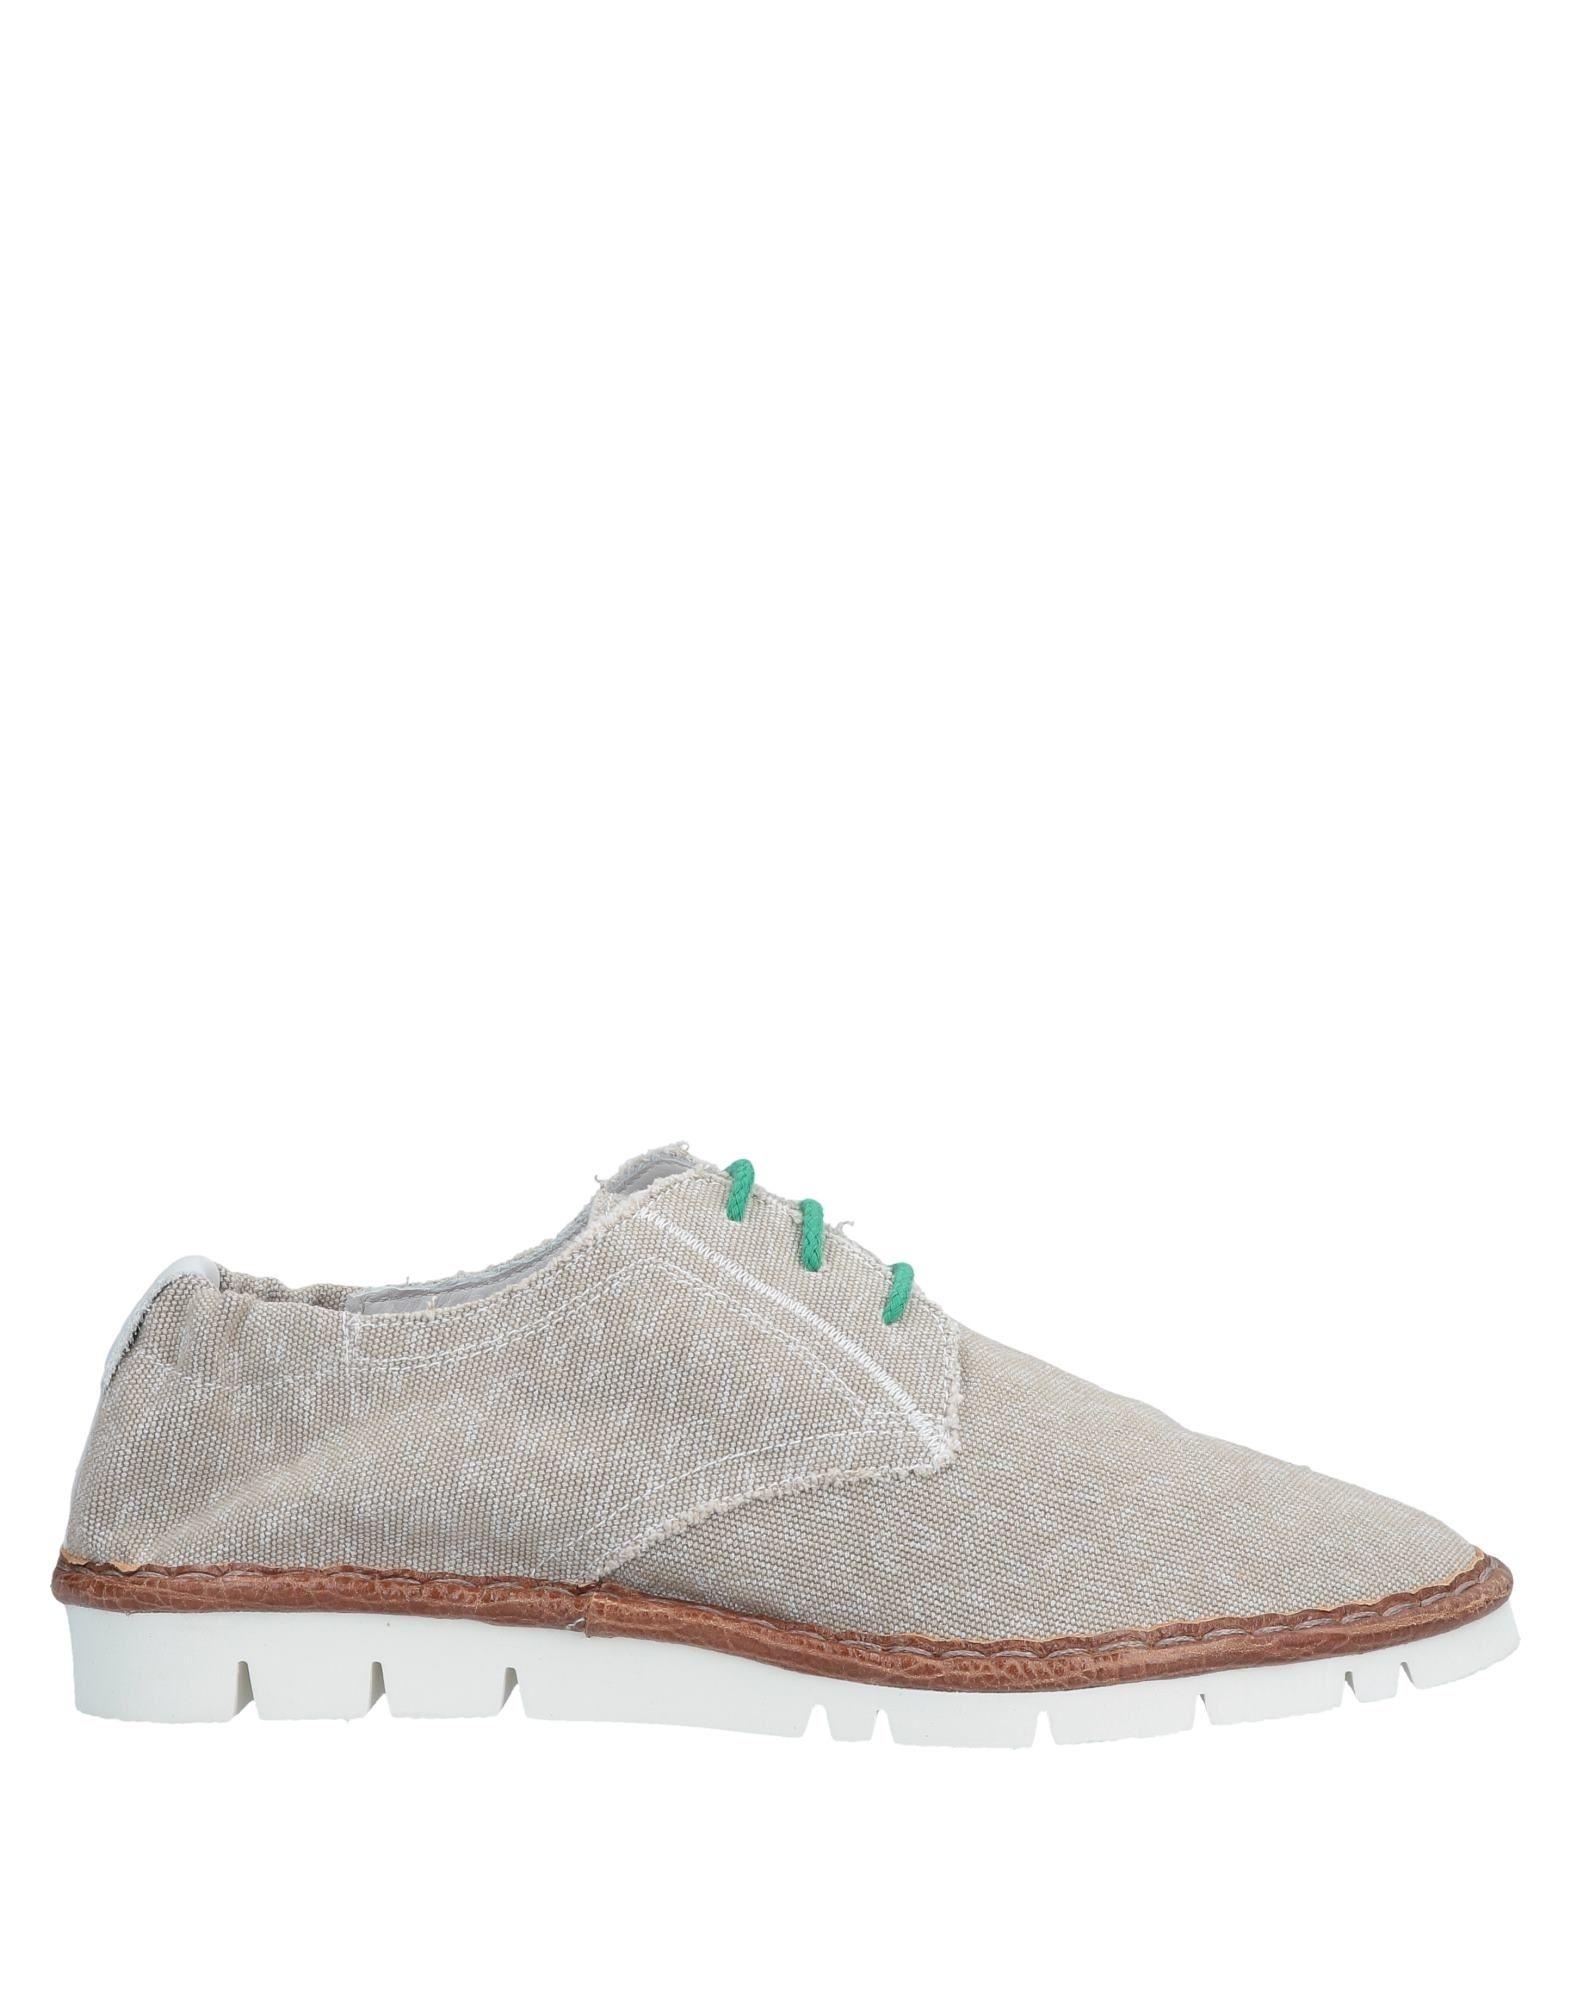 WATSON & PARKER Обувь на шнурках 3 3 trepuntotre обувь на шнурках